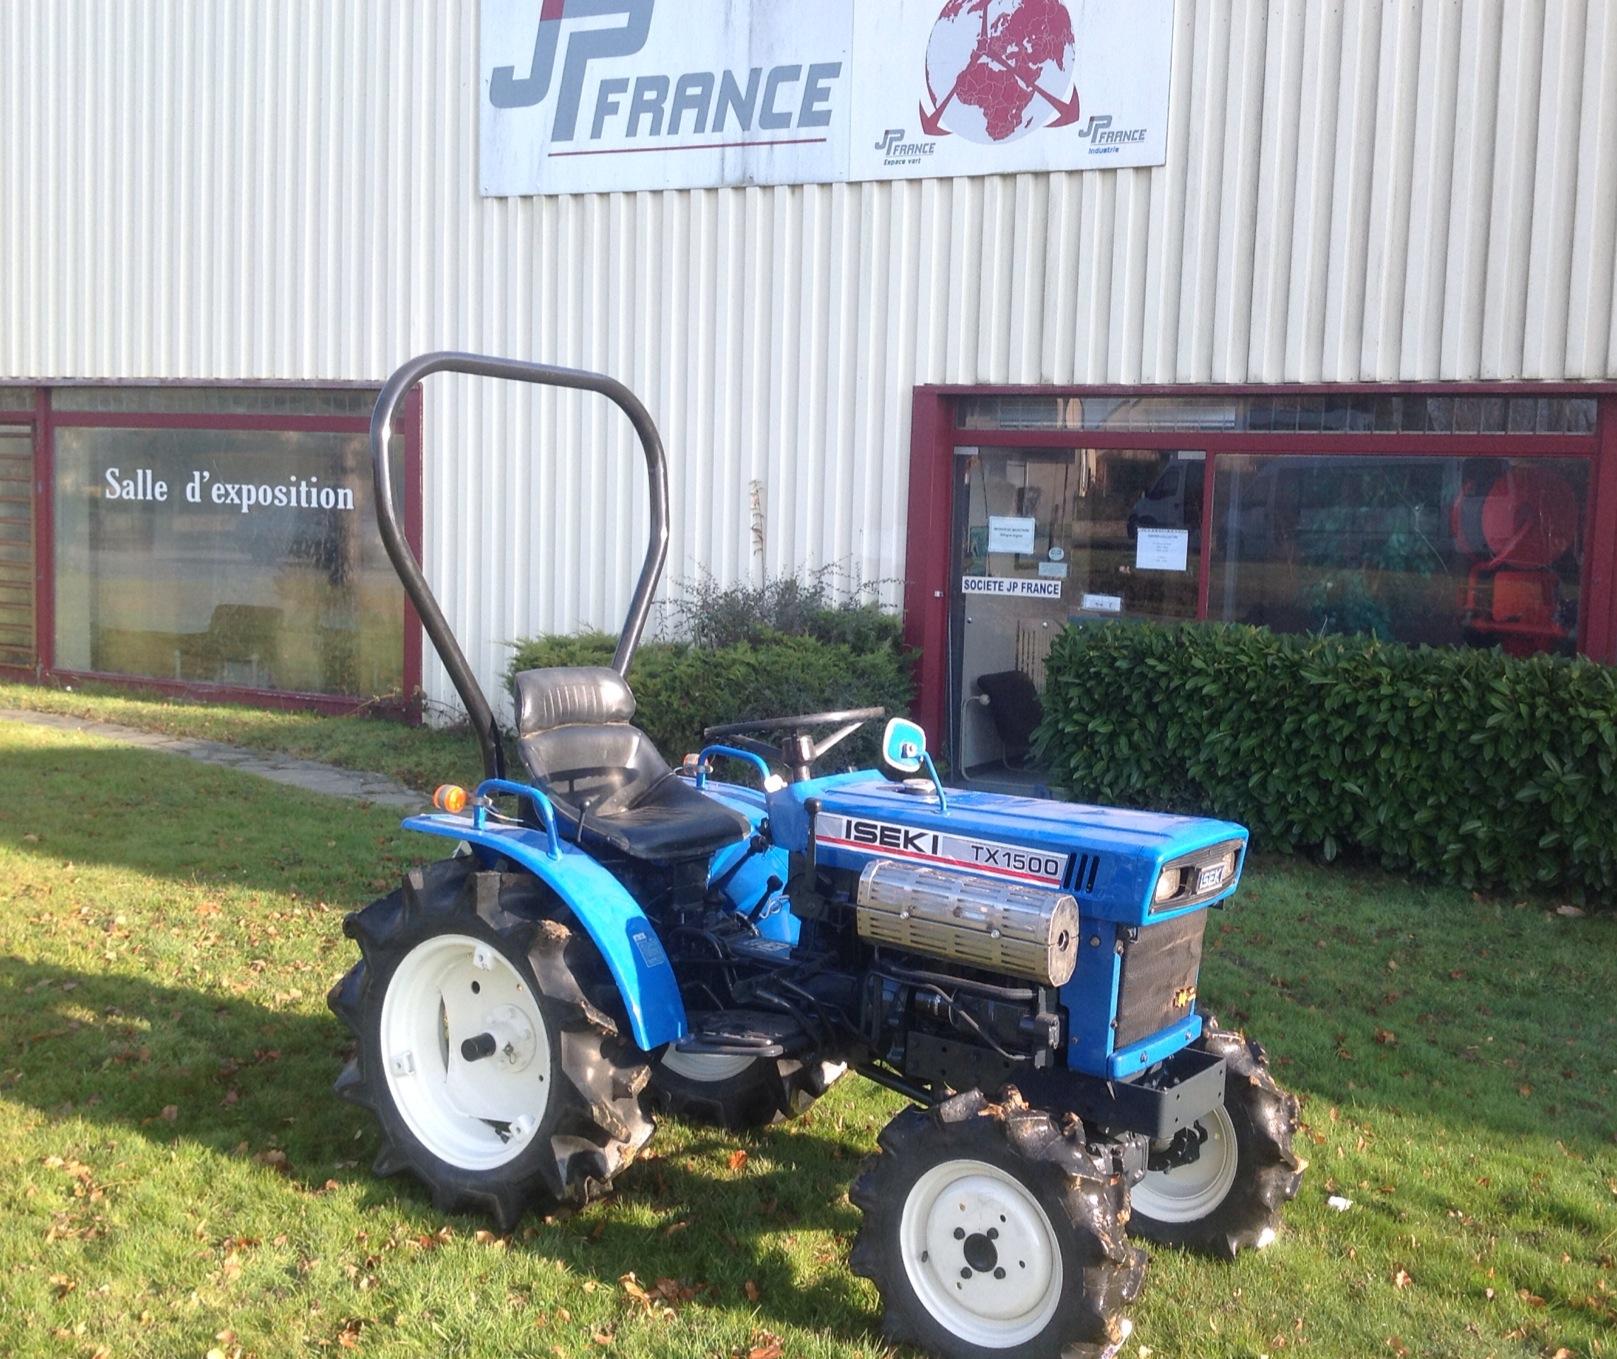 jp france tracteur iseki tx13 1500 4 rm 14 15cv jpl tracteurs et microtracteurs. Black Bedroom Furniture Sets. Home Design Ideas